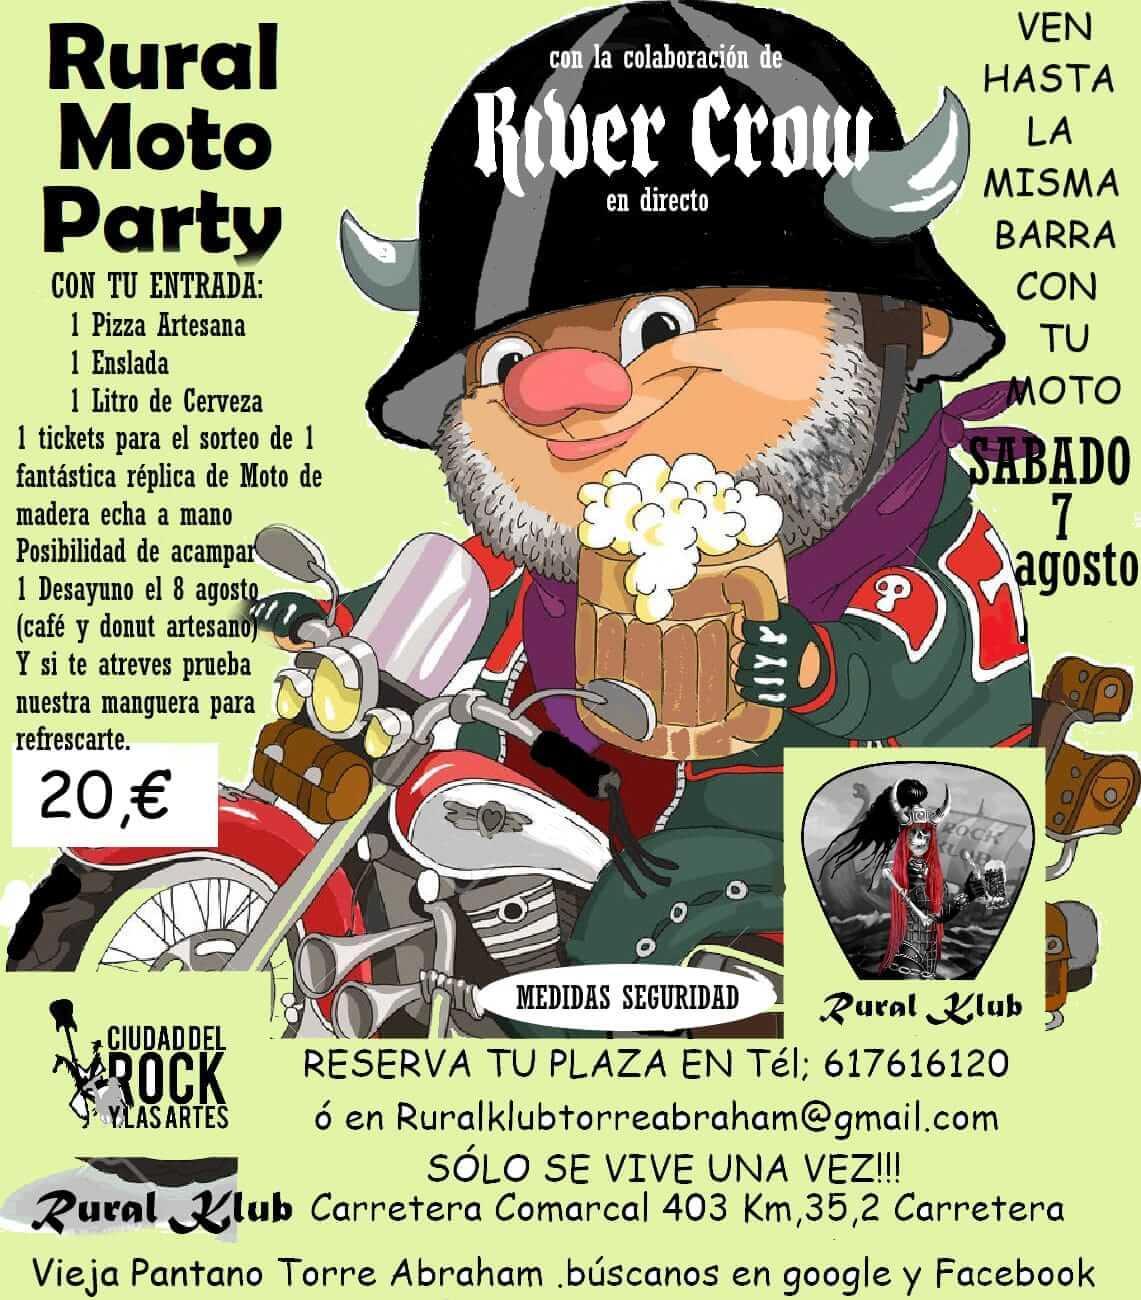 Rural Moto Party